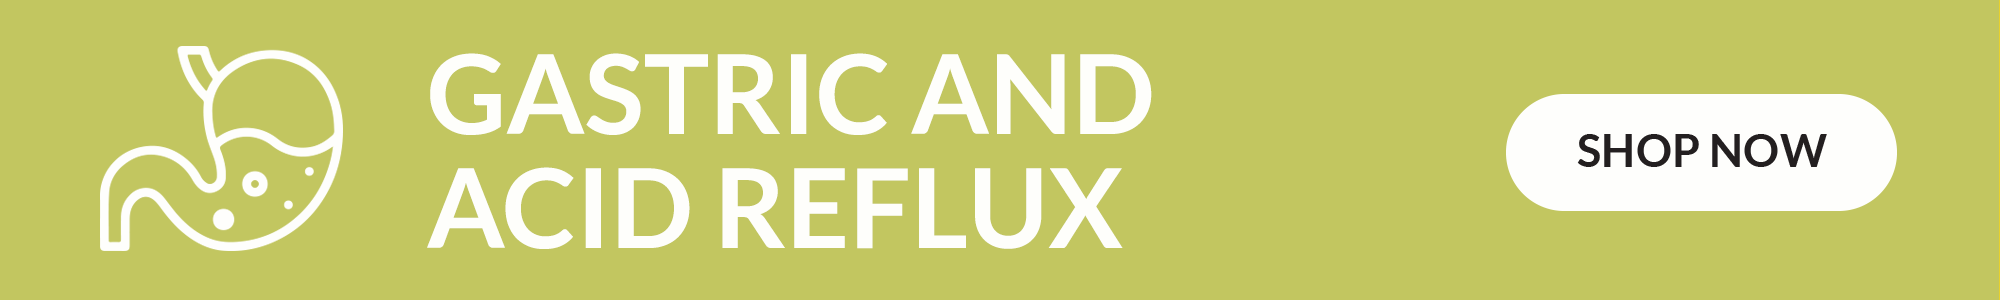 gastric-and-acid-reflux-header.png